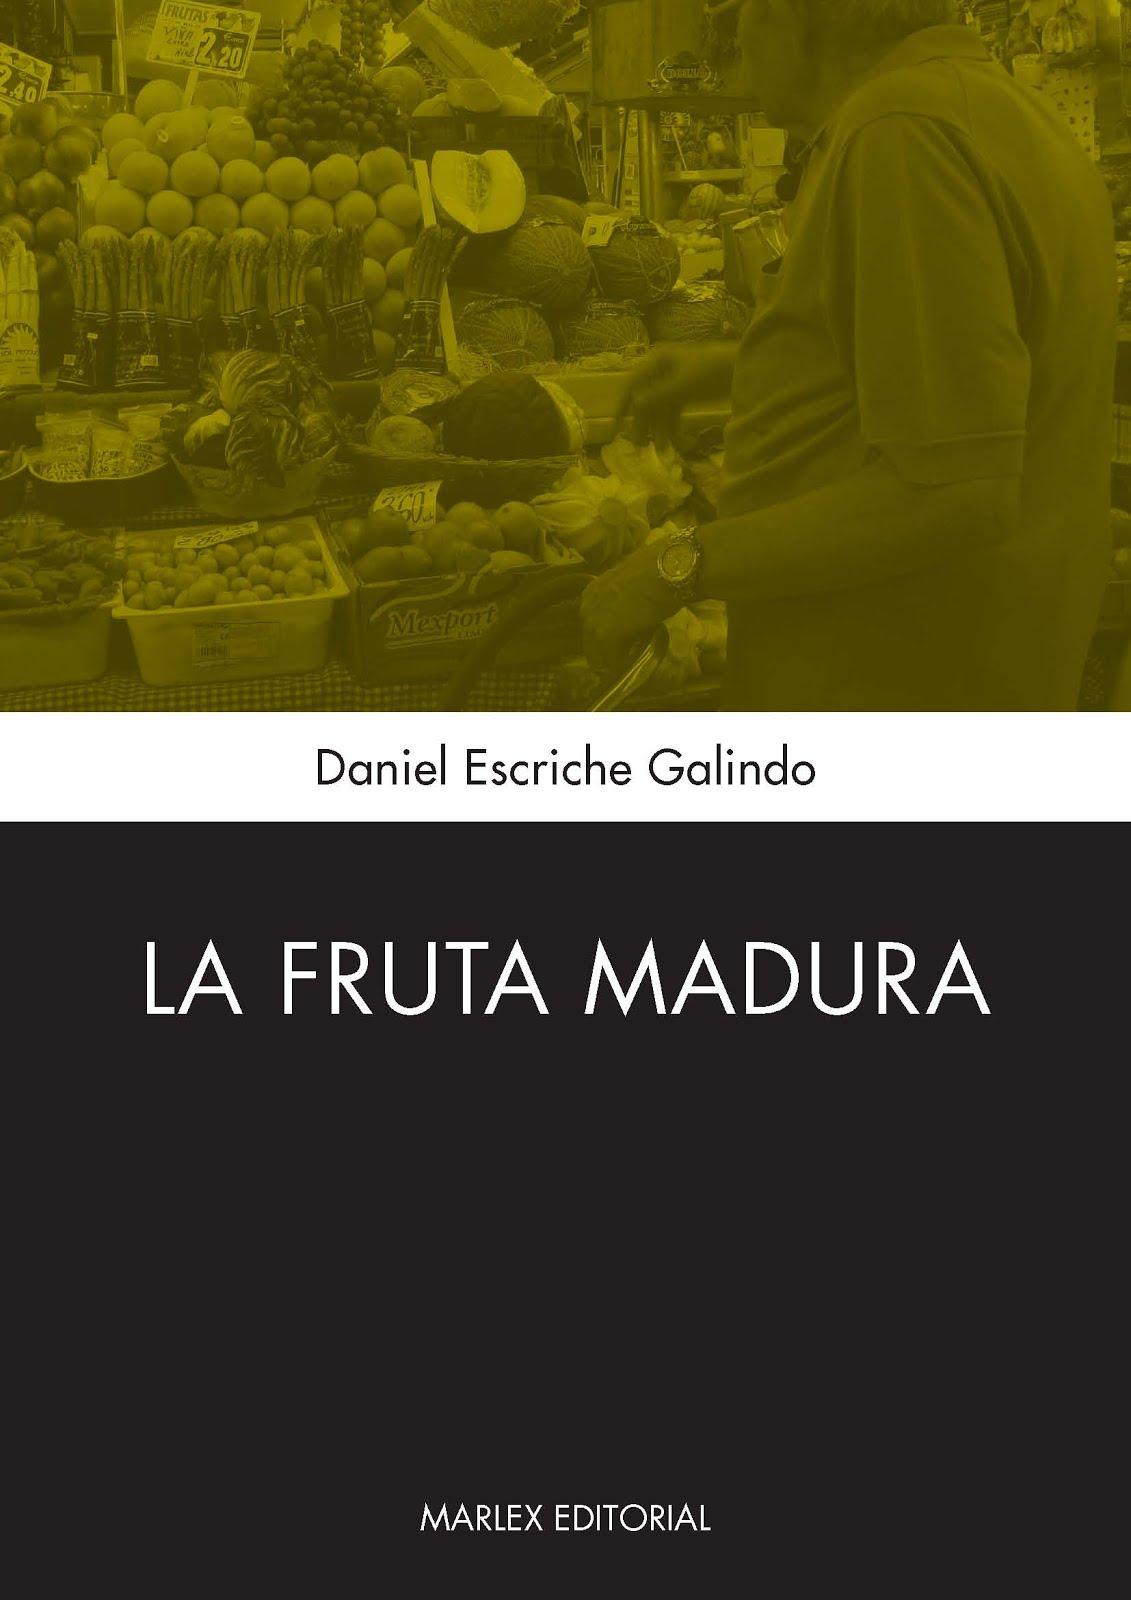 Mi primera novela editada en ebook